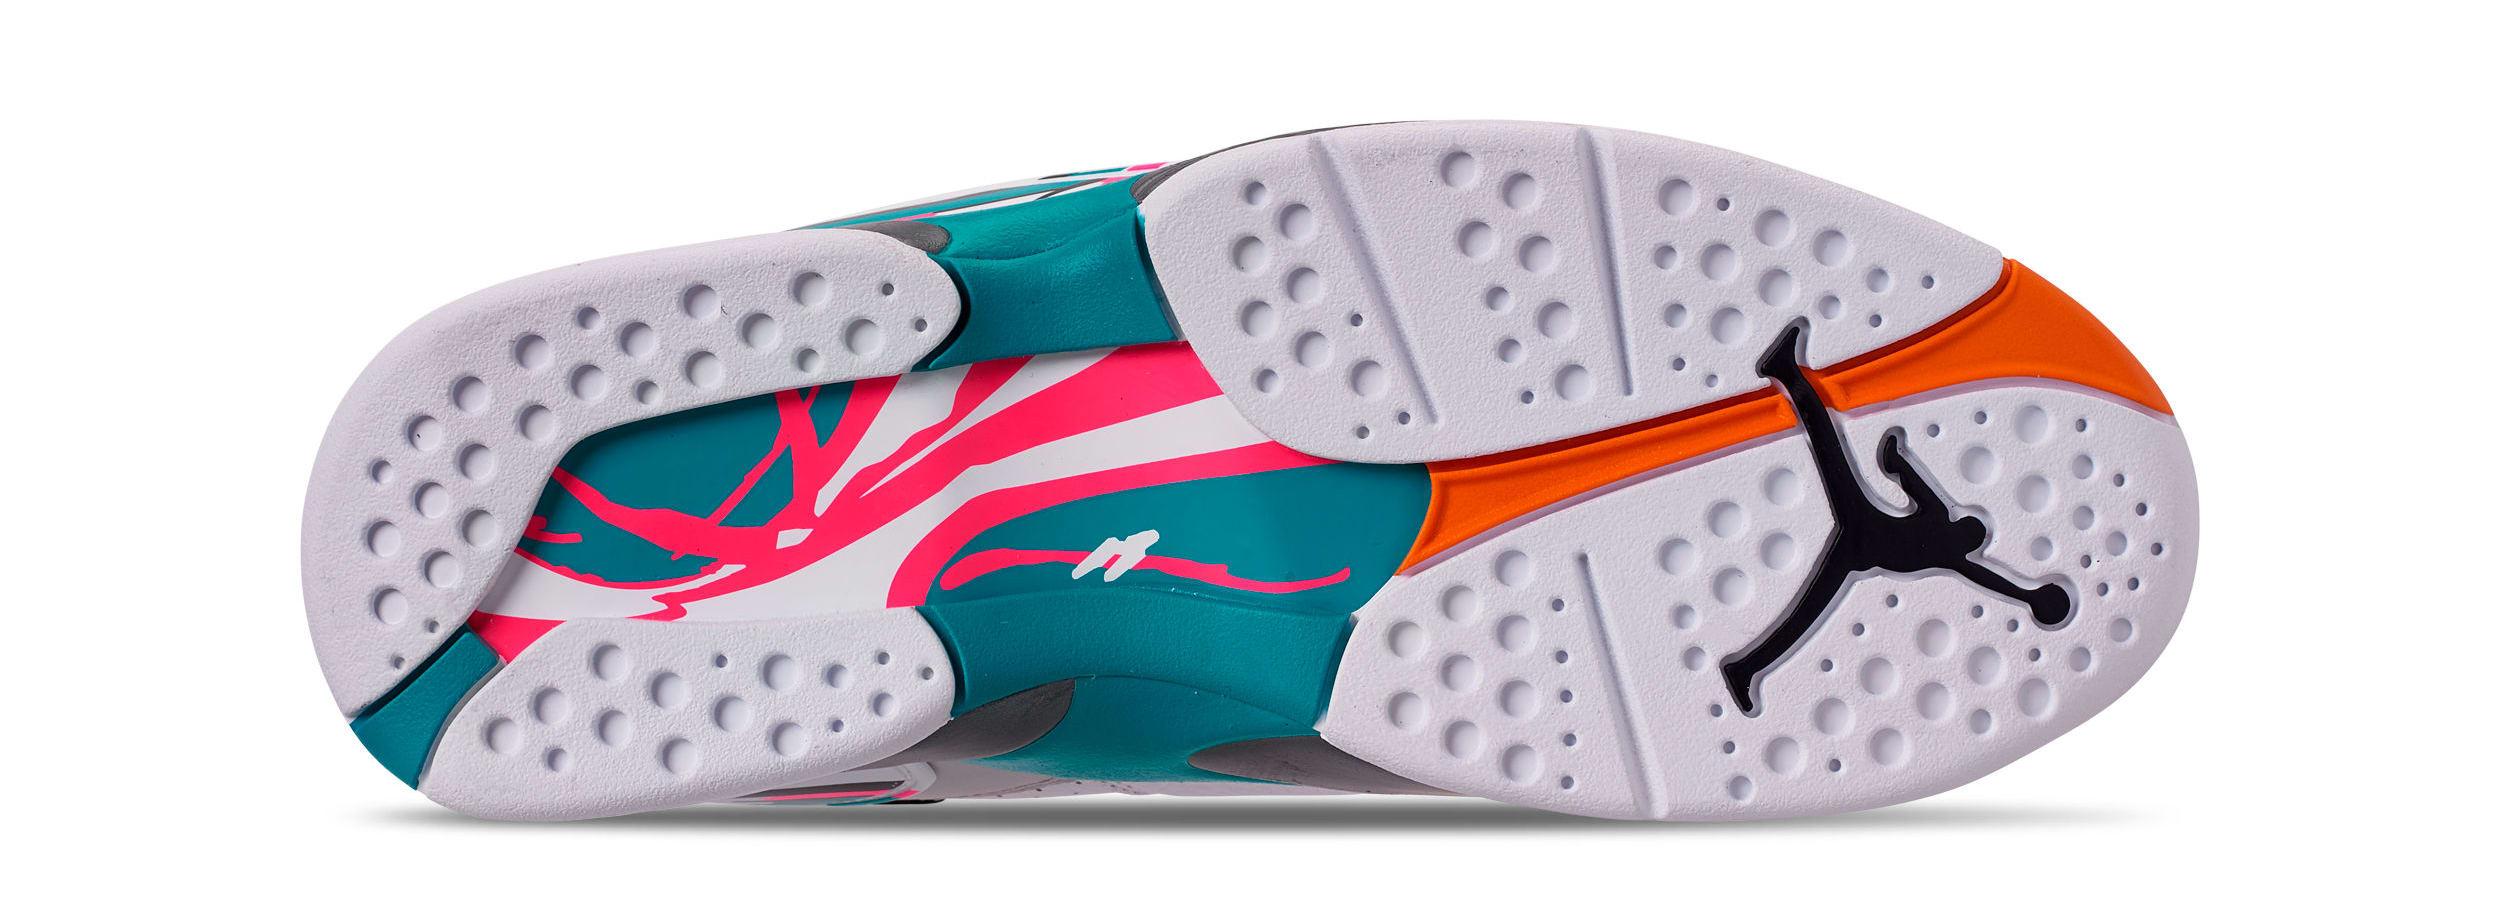 73bb6895fe844 Air Jordan 8 VIII South Beach Release Date 305381-113 | Premier Kicks